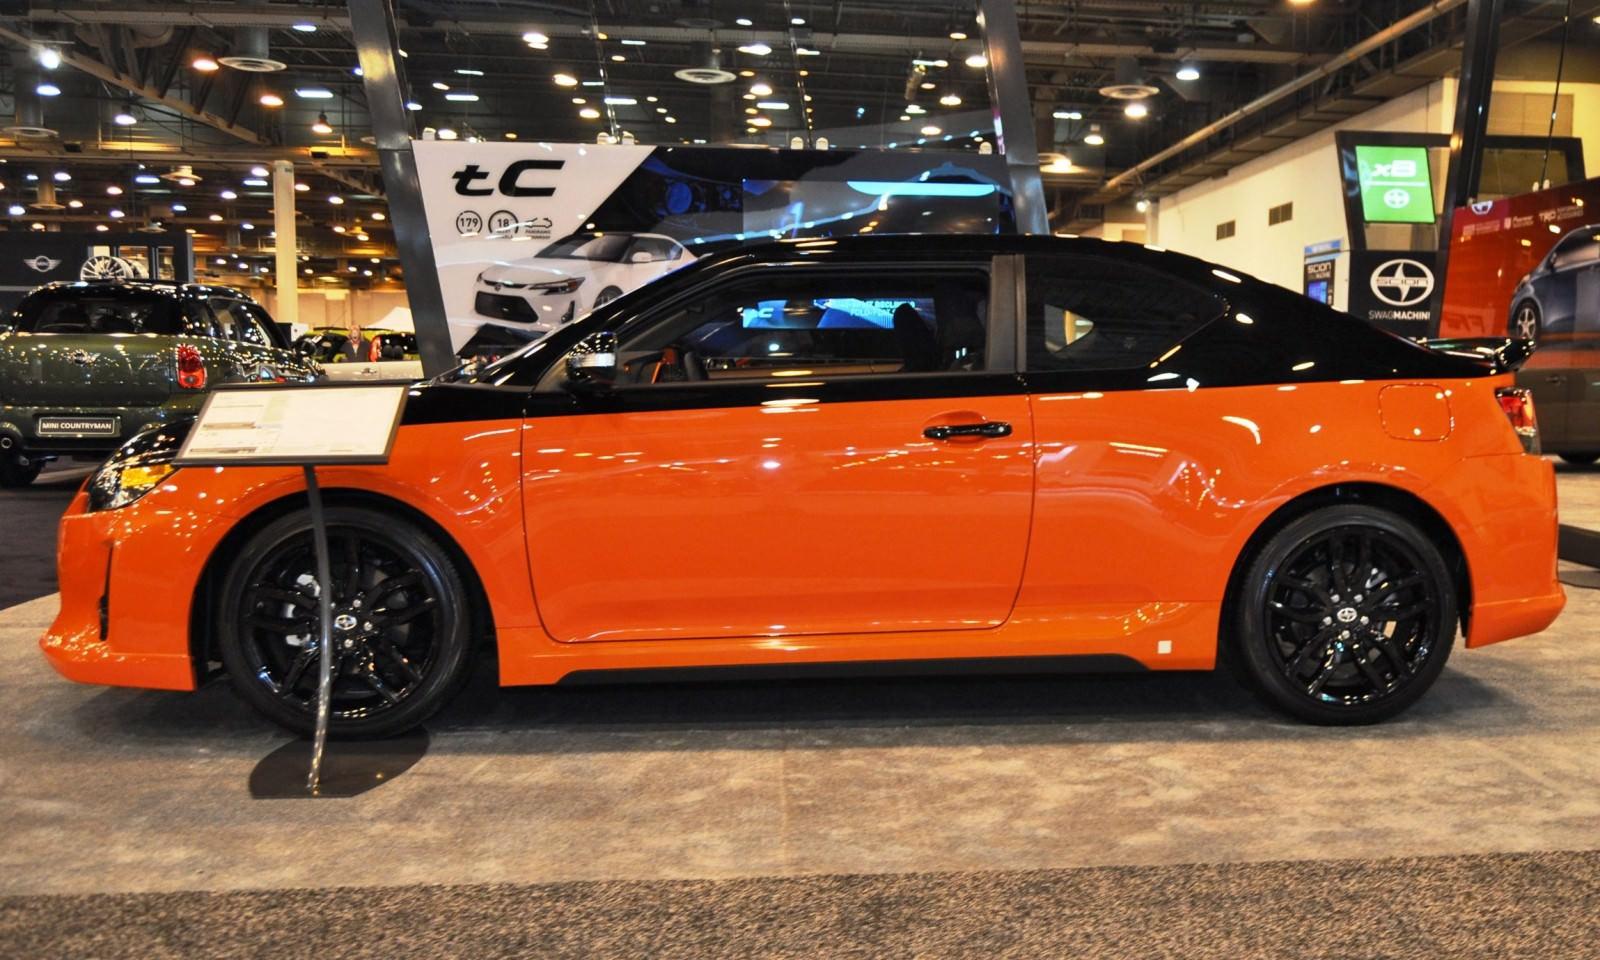 Scion Tc Rs 9 >> 2015 Scion tC RS9